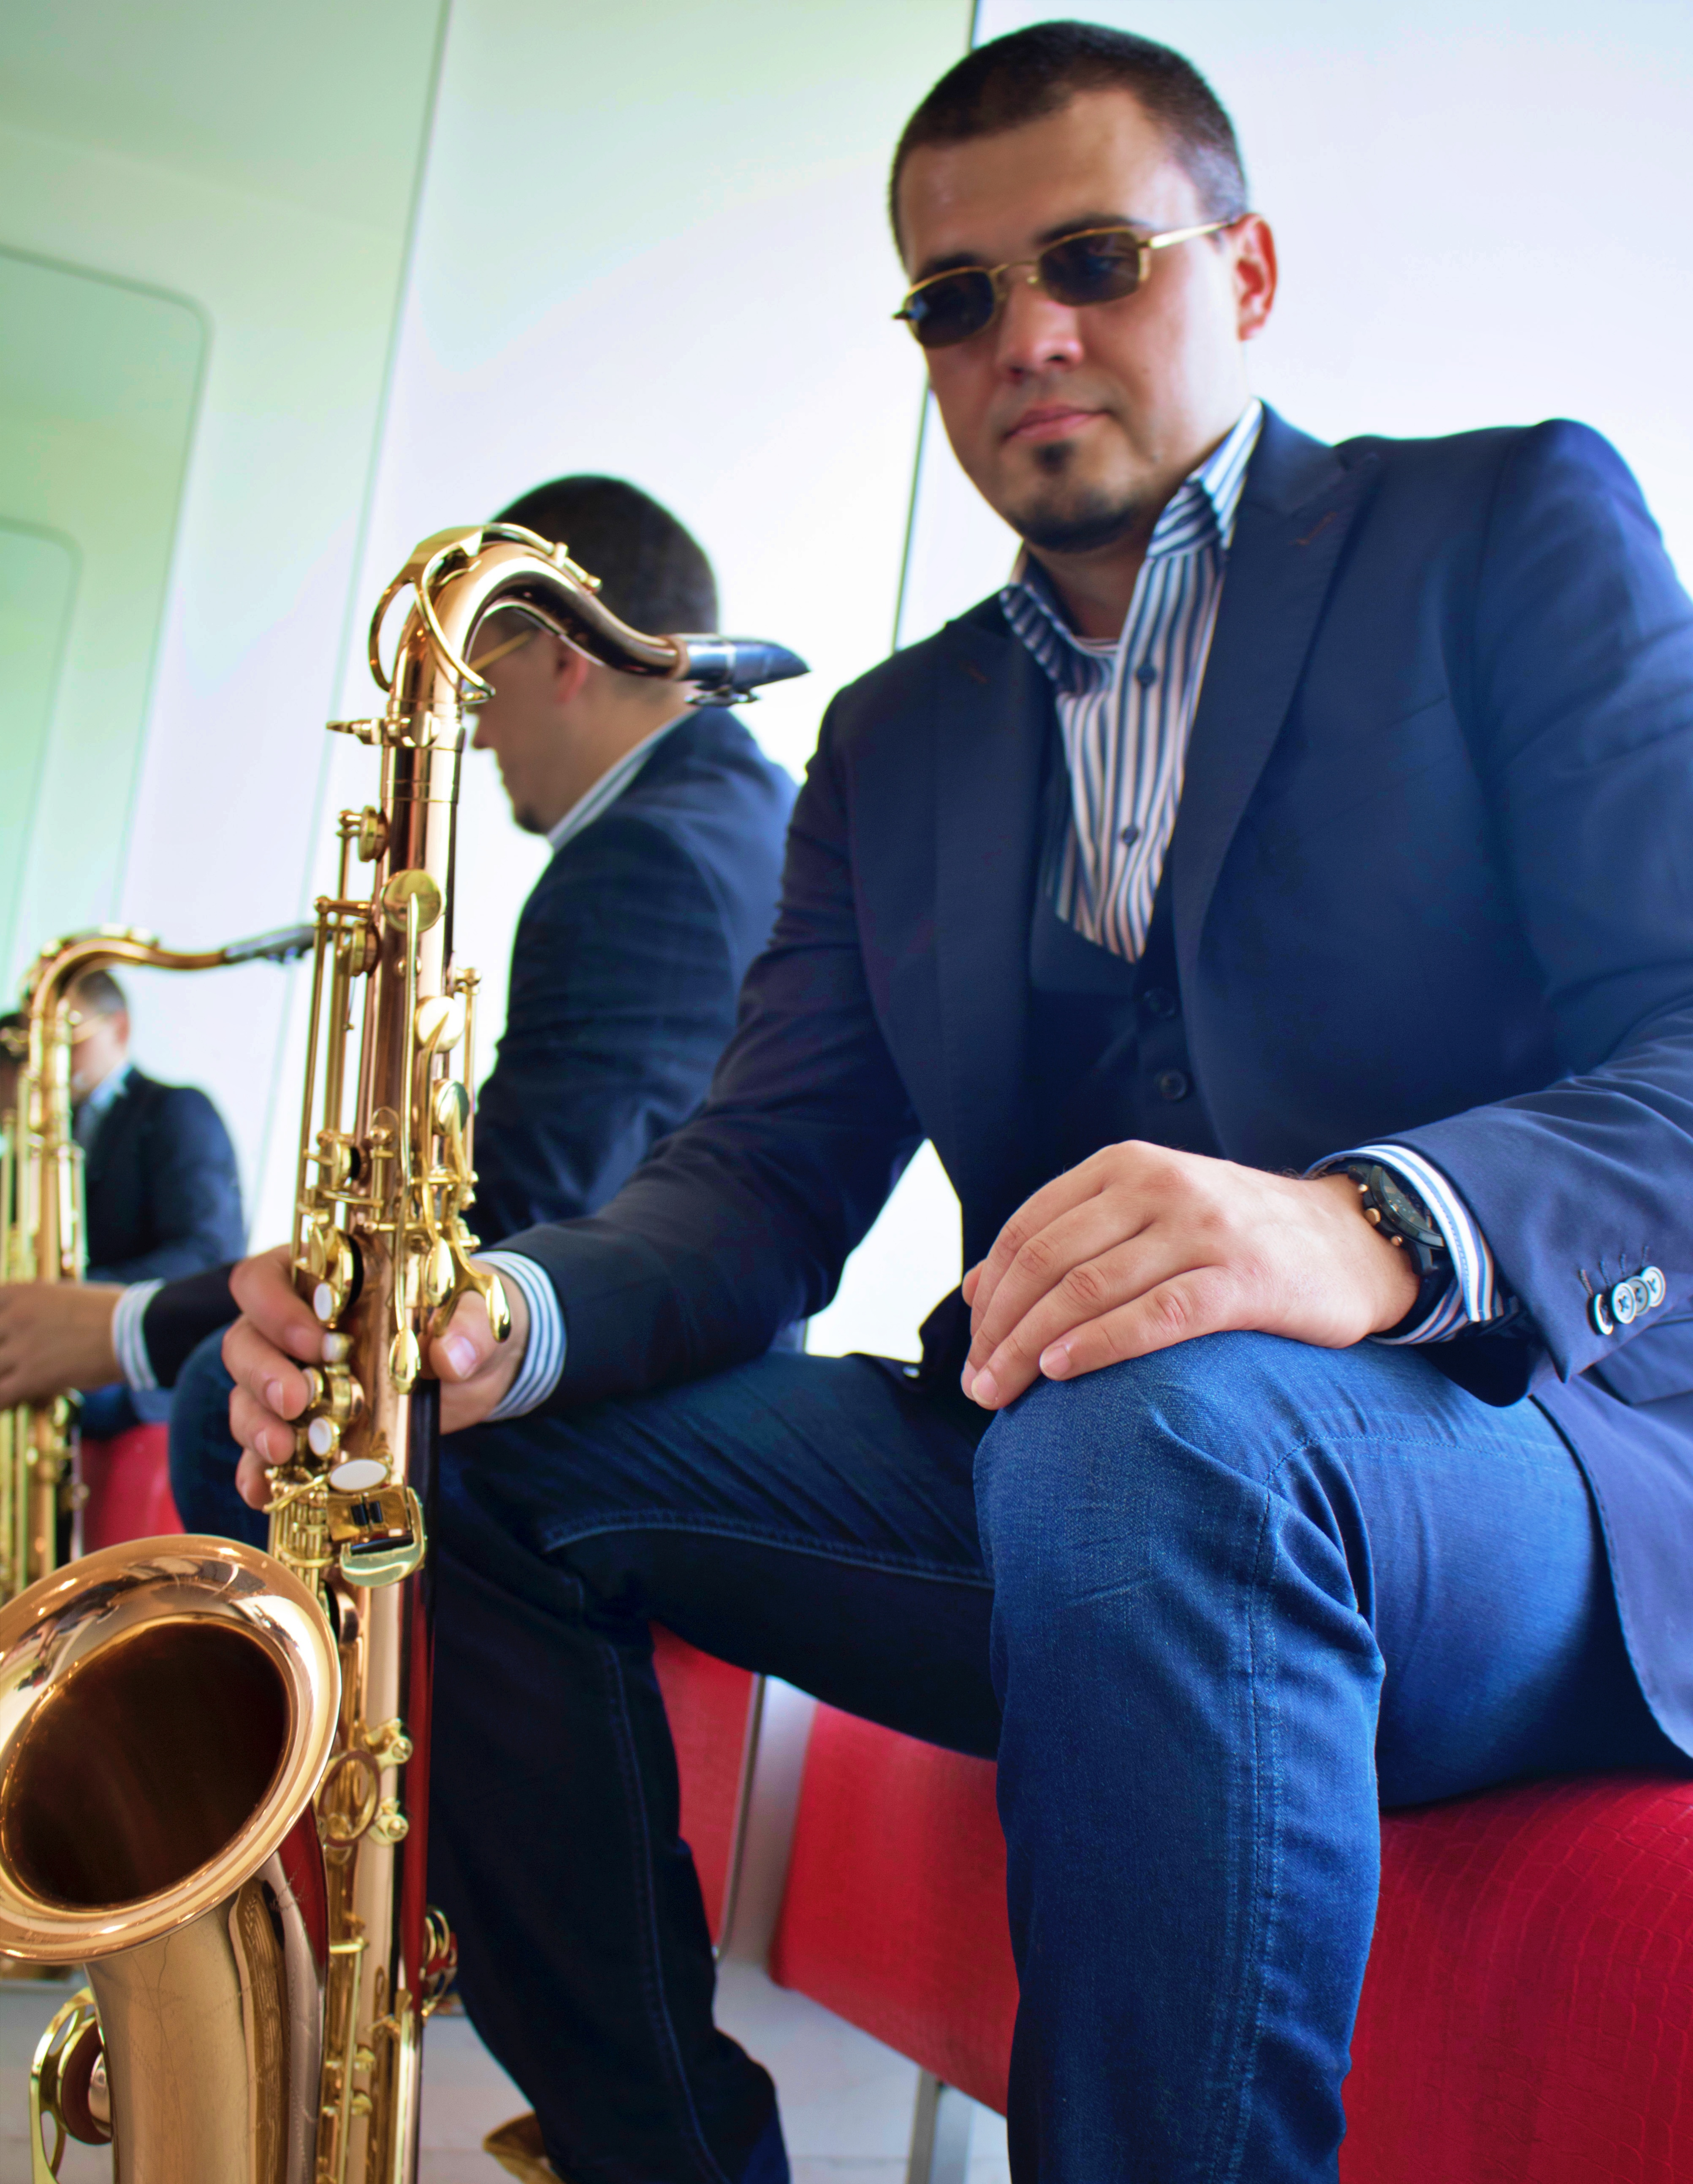 Saxophonist Frankfurt